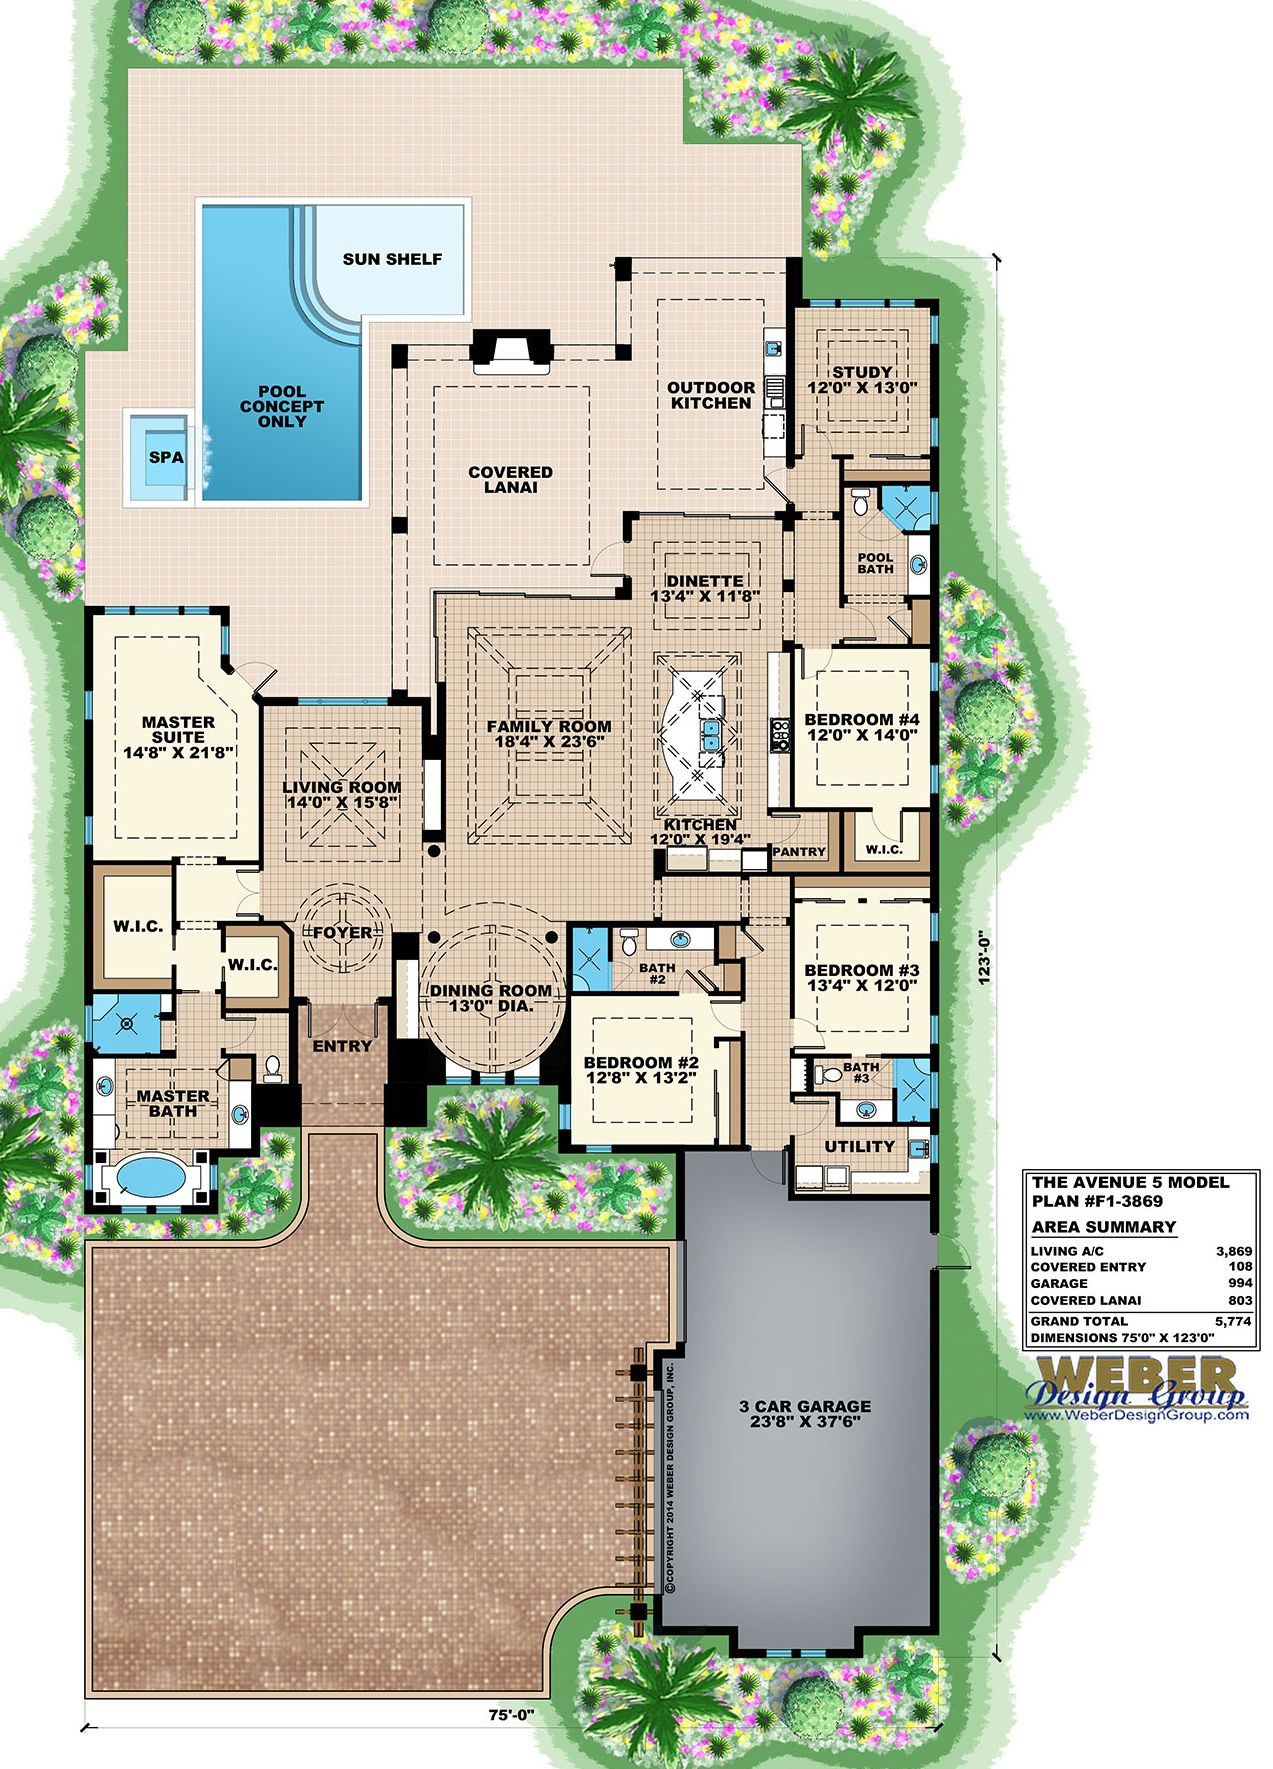 Beach House Plan 1 Story Coastal Contemporary Home Floor Plan Beach House Plans Pool House Plans House Plans With Photos